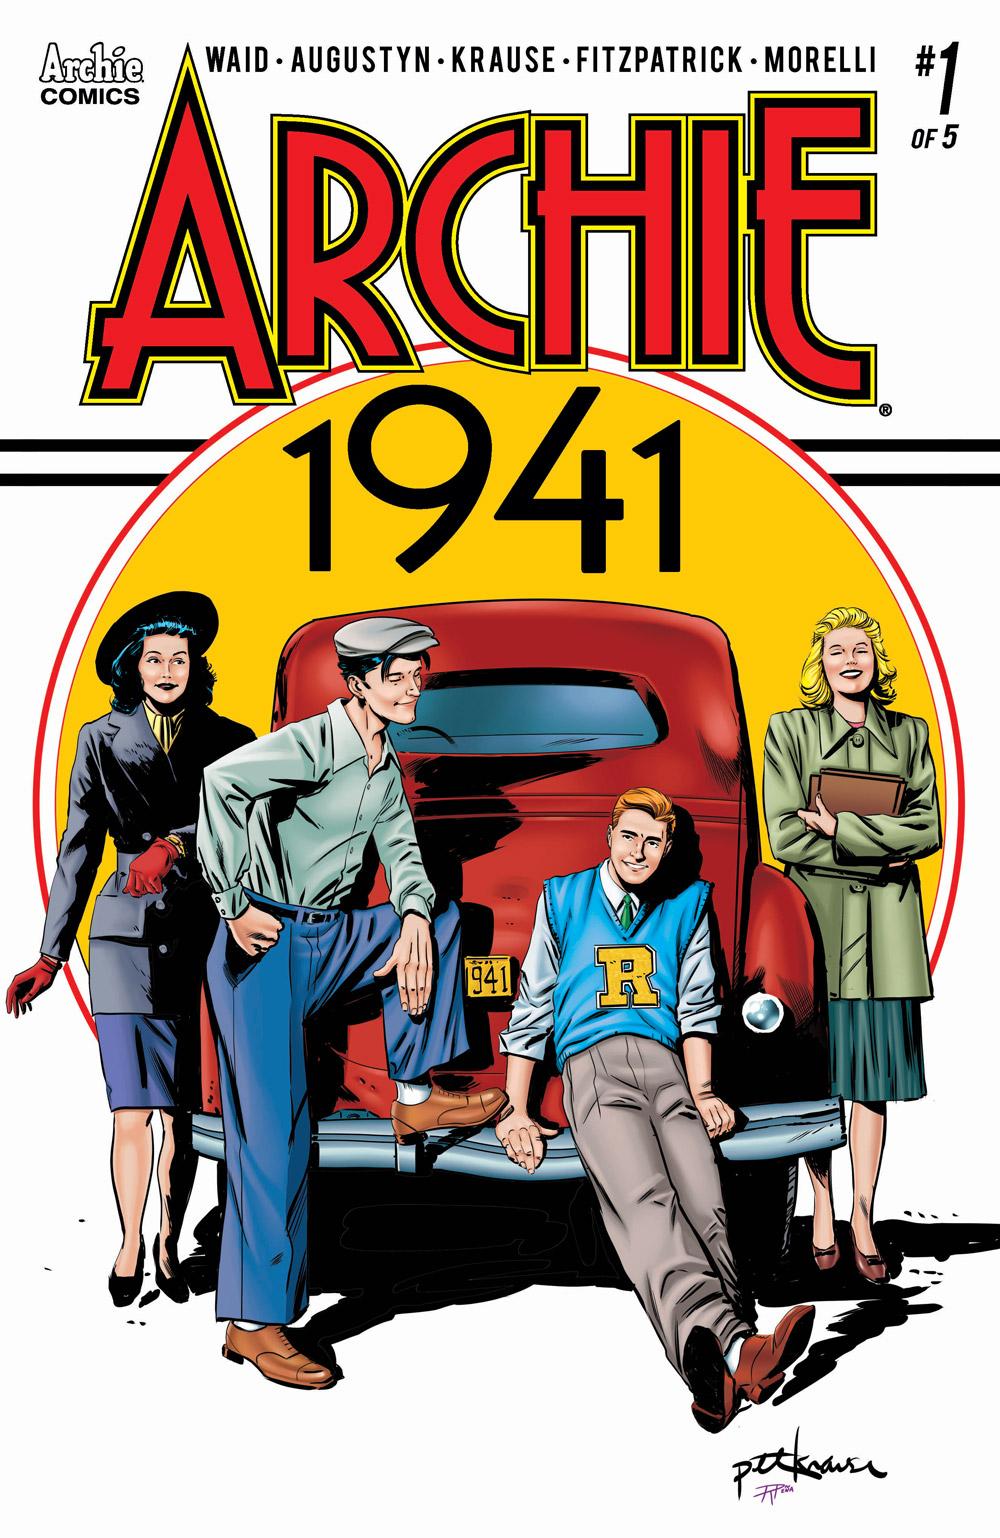 Archie1941#1Krause.jpg